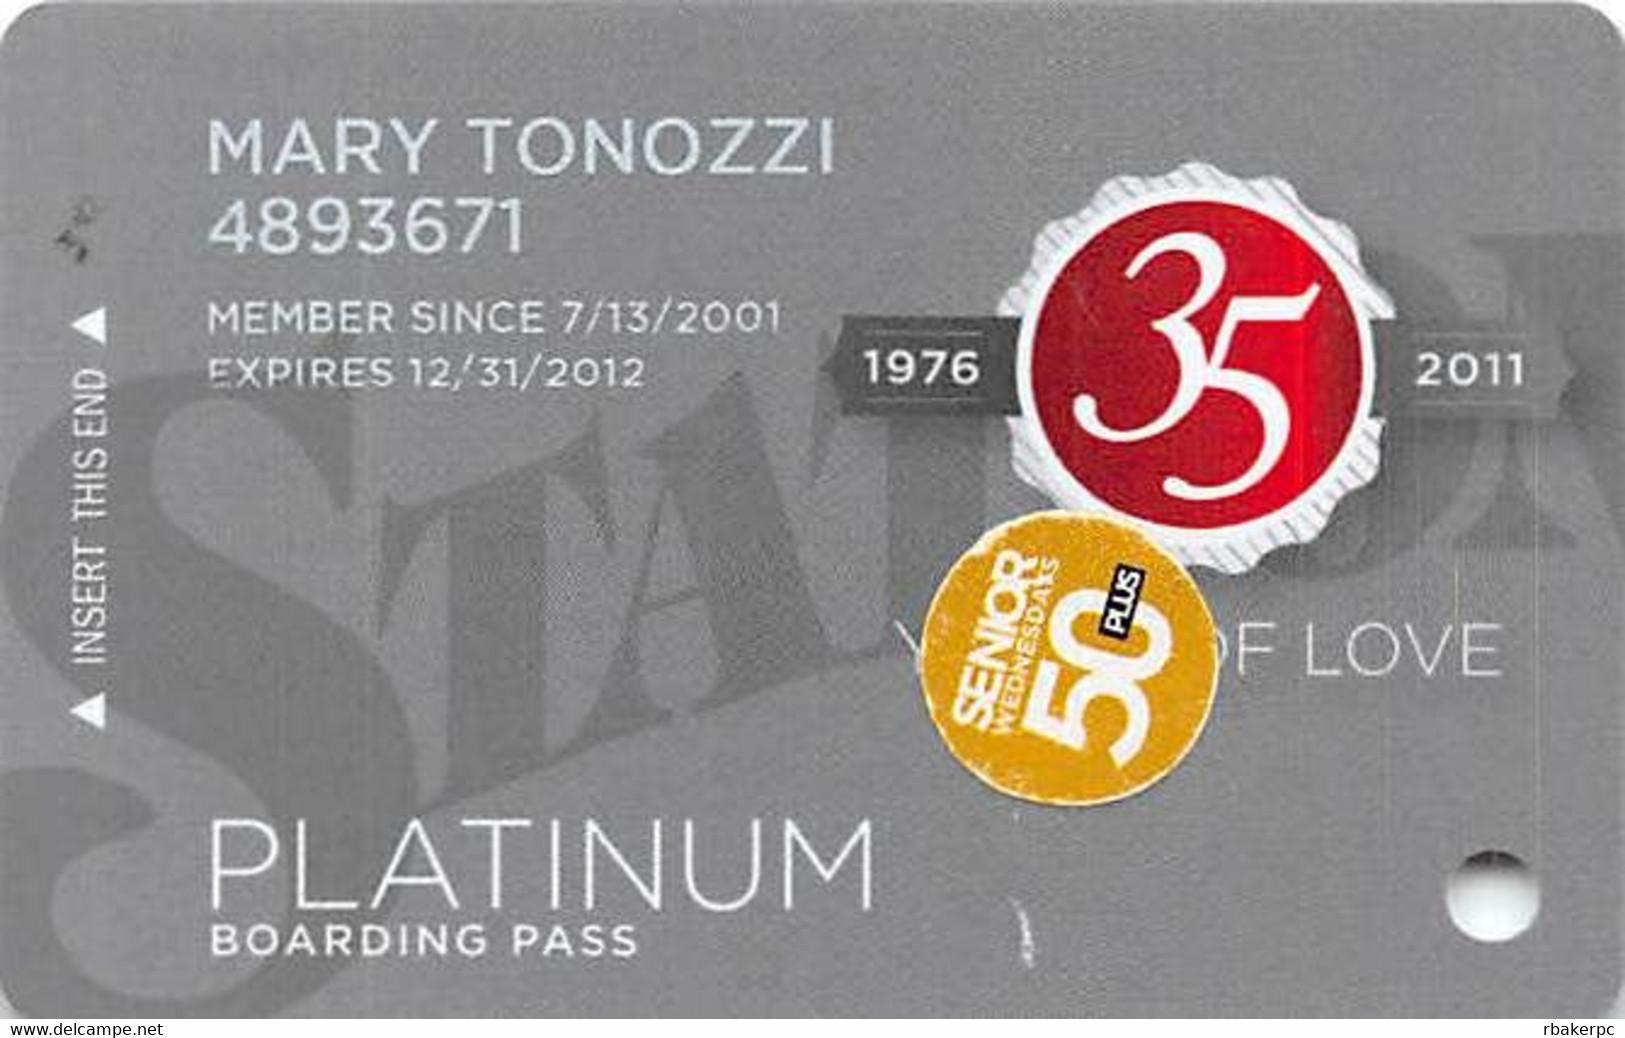 Station Casinos Las Vegas, NV - Slot Card Copyright 2011 - Platinum / Large Space Under Logos / 50+ - Casino Cards